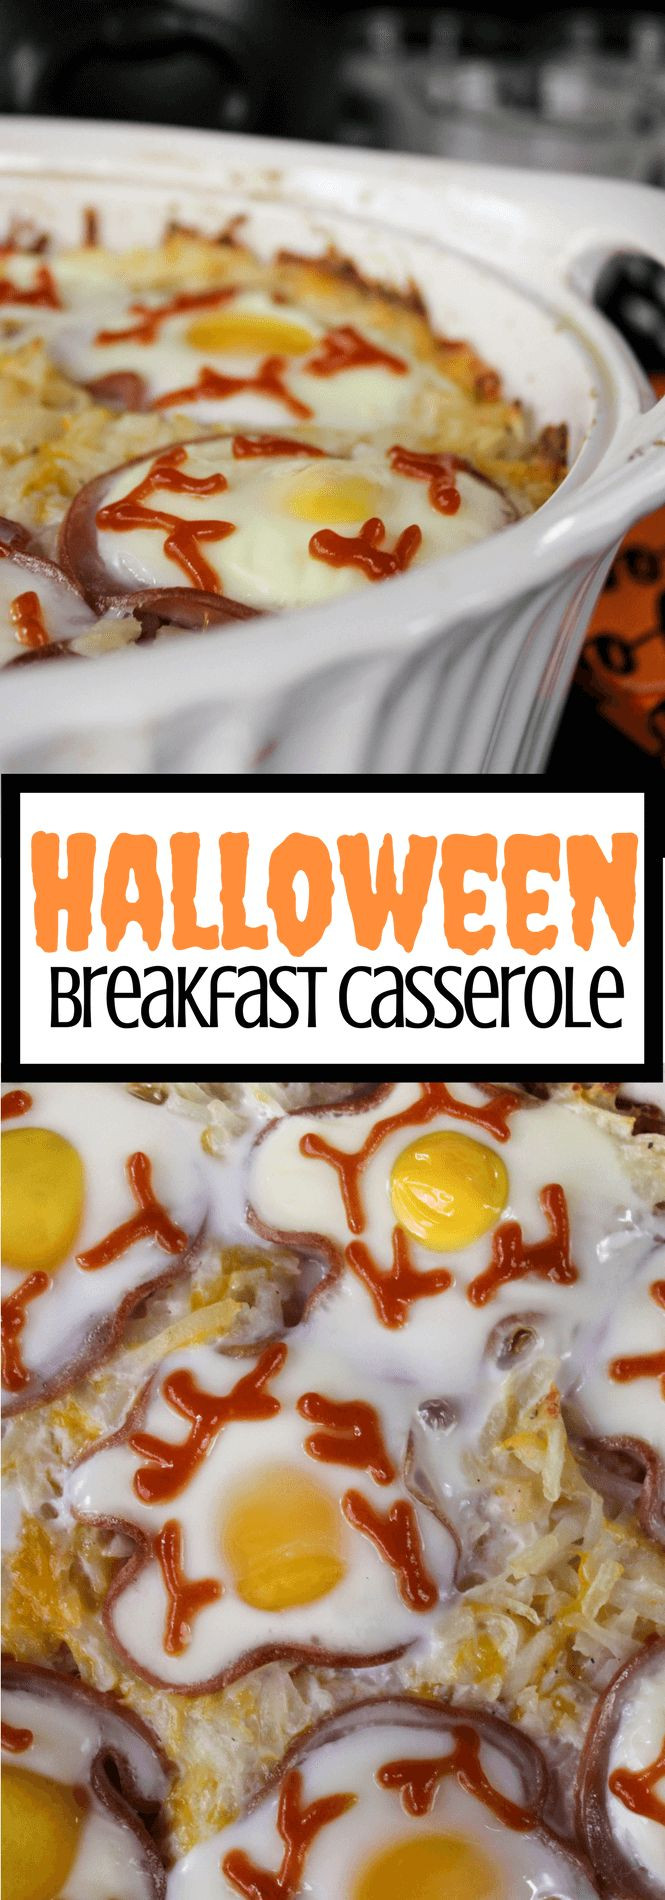 Halloween Breakfast Recipes  Best 25 Halloween breakfast ideas on Pinterest